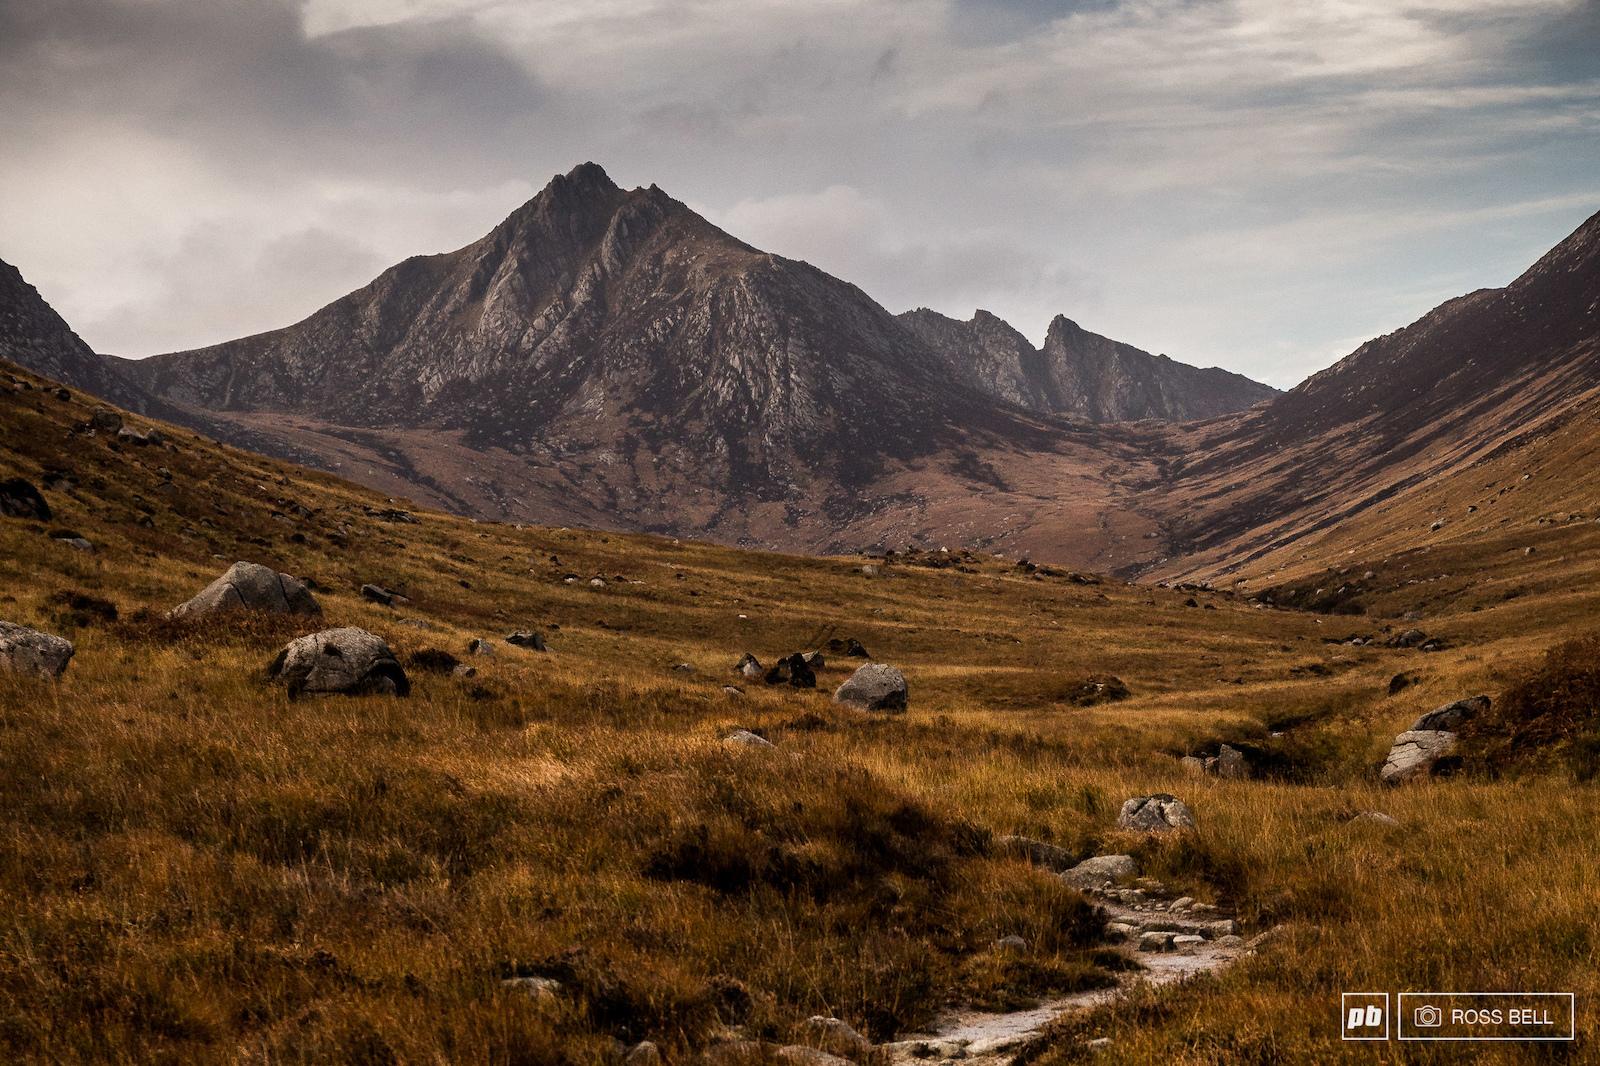 Glen Rosa on the Isle of Arran on the West Coast of Scotland.